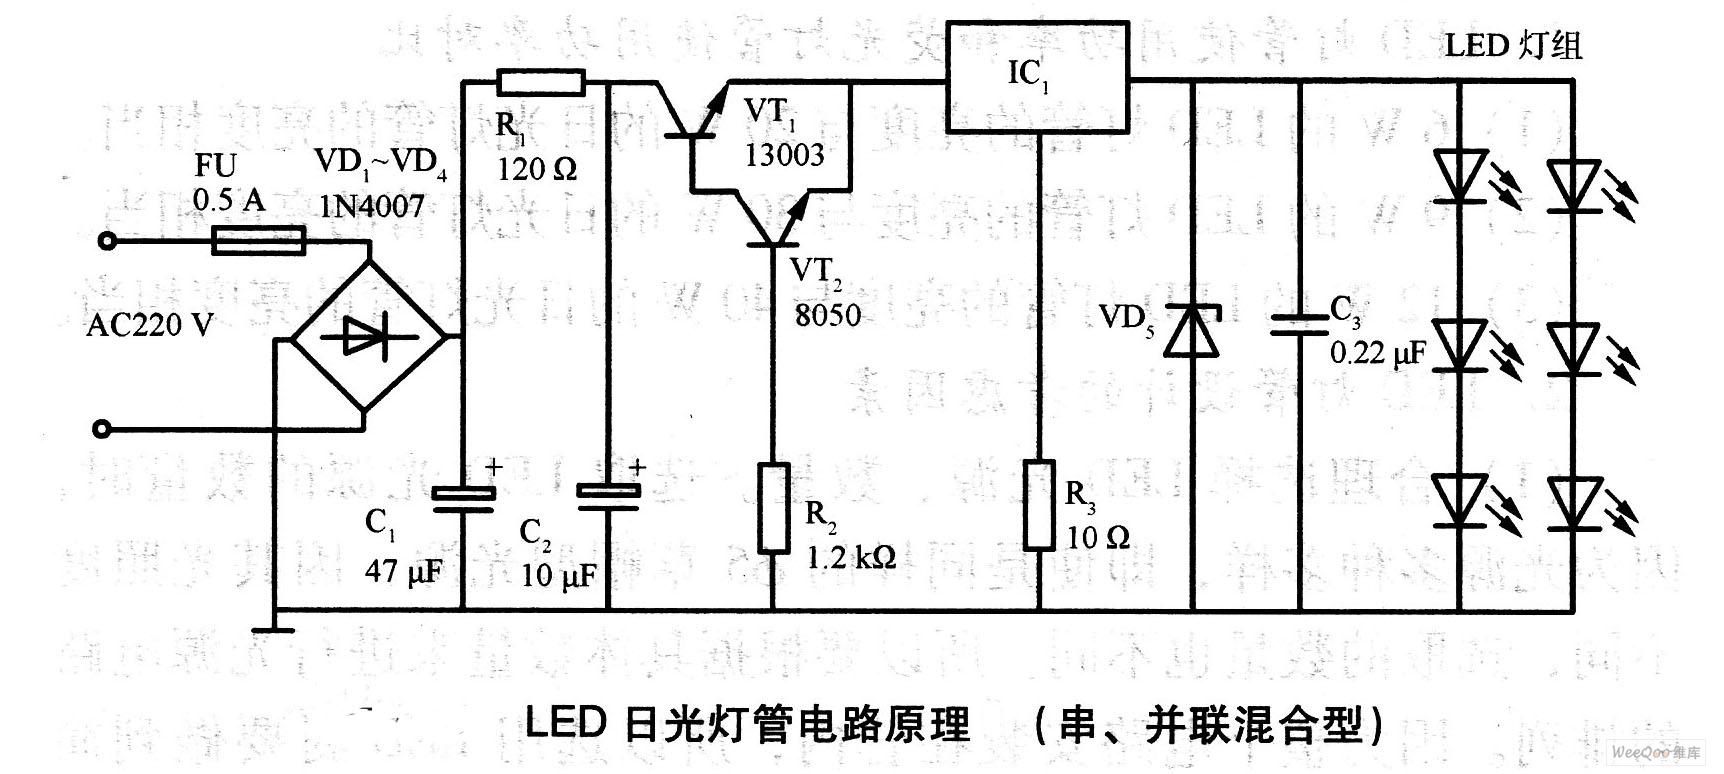 LED日光灯管电路原理图